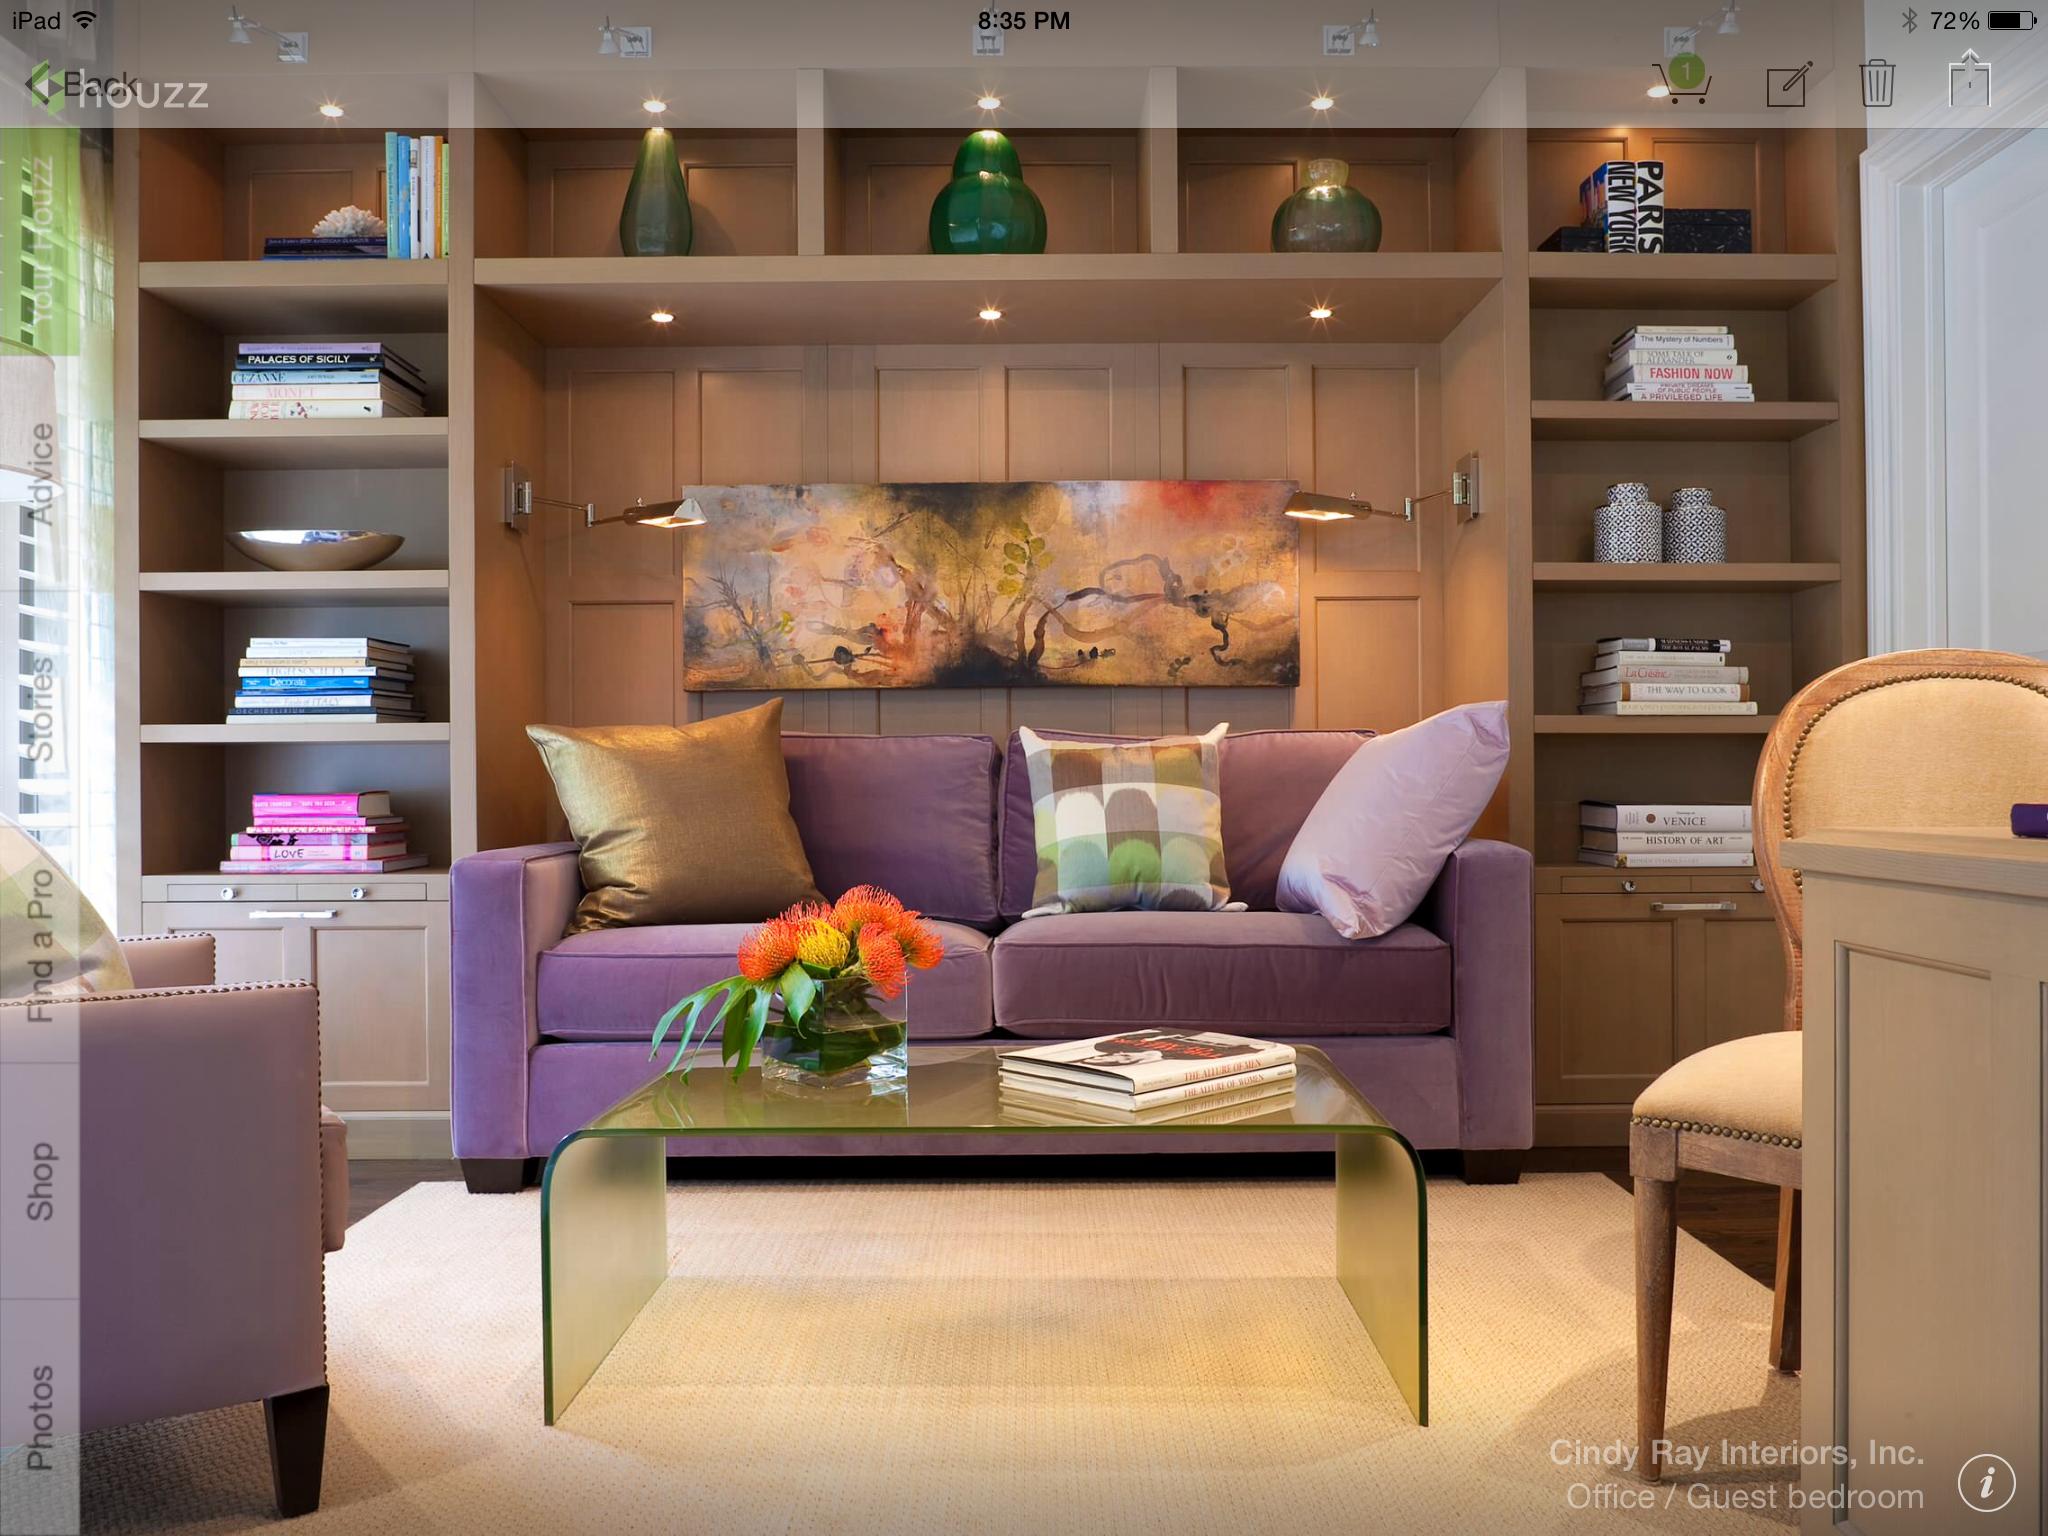 Cozy condo living rooms pin by tina jagros on guest bedroom  pinterest  condo bedroom